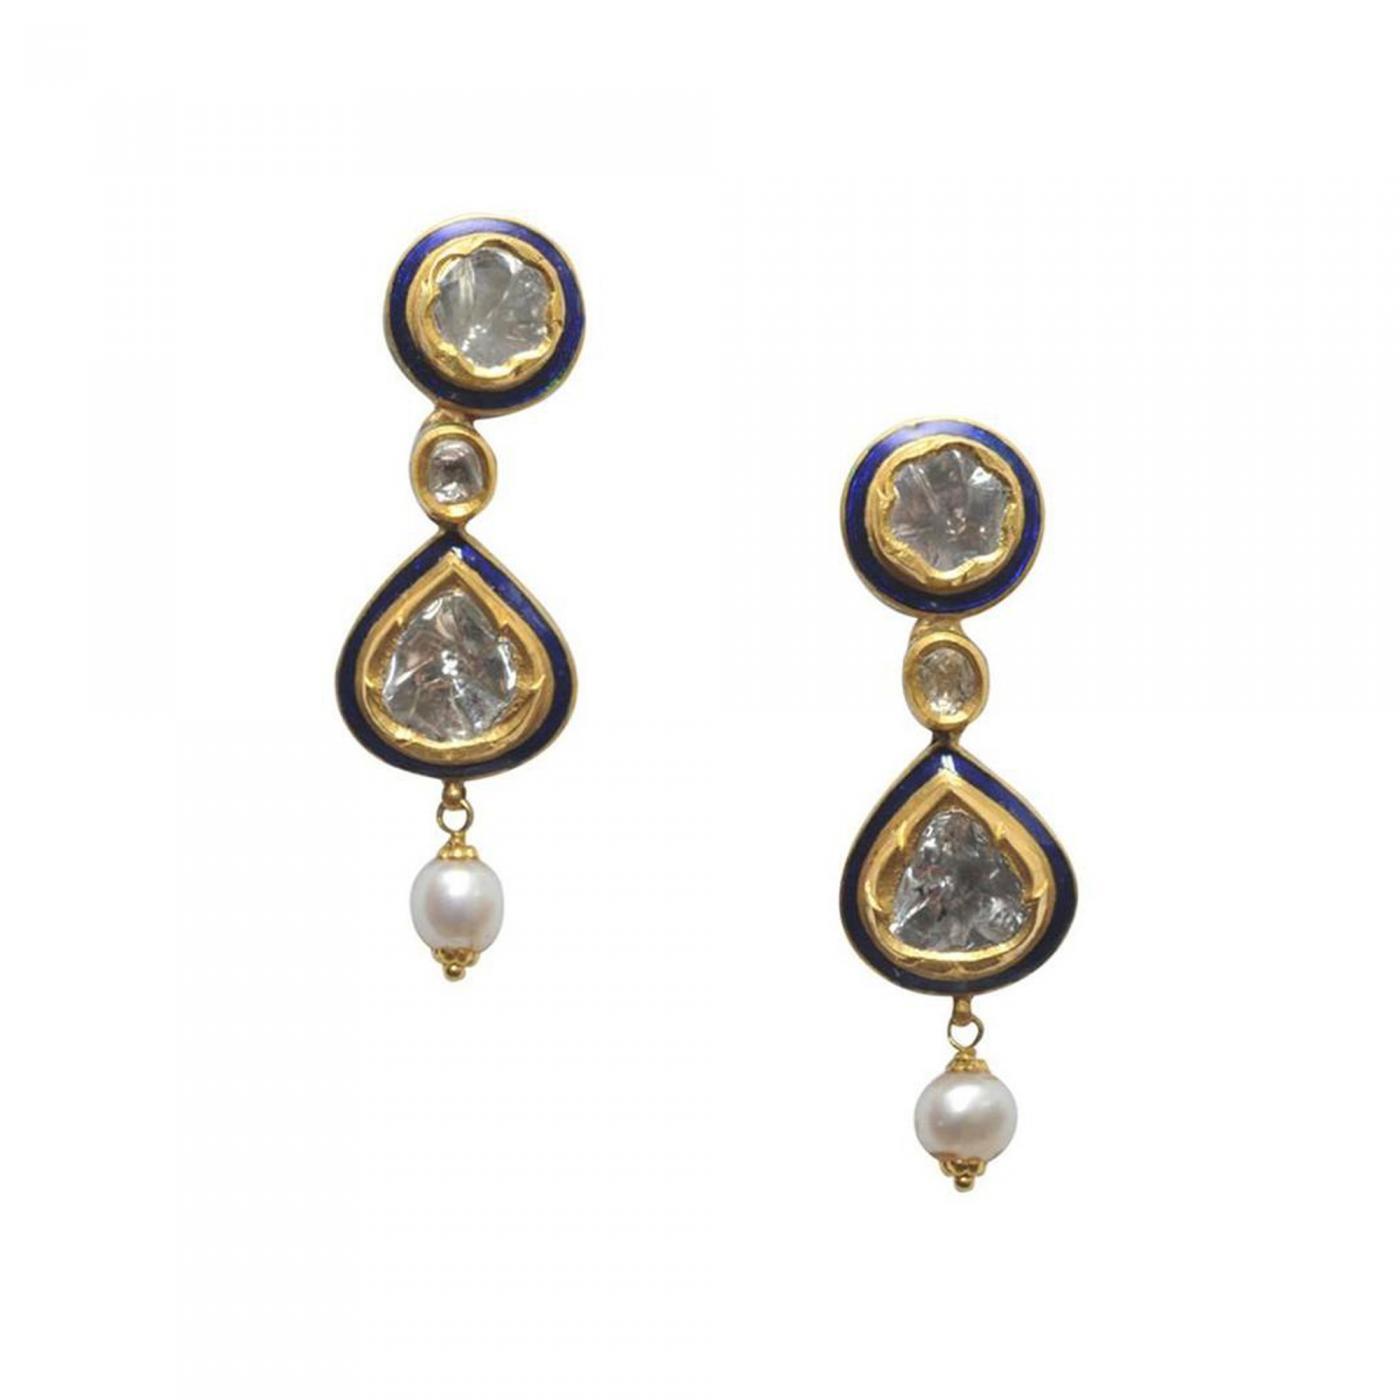 Rosecut Diamonds Blue Enamel And 22 Karat Gold Earrings With Pearl Drop